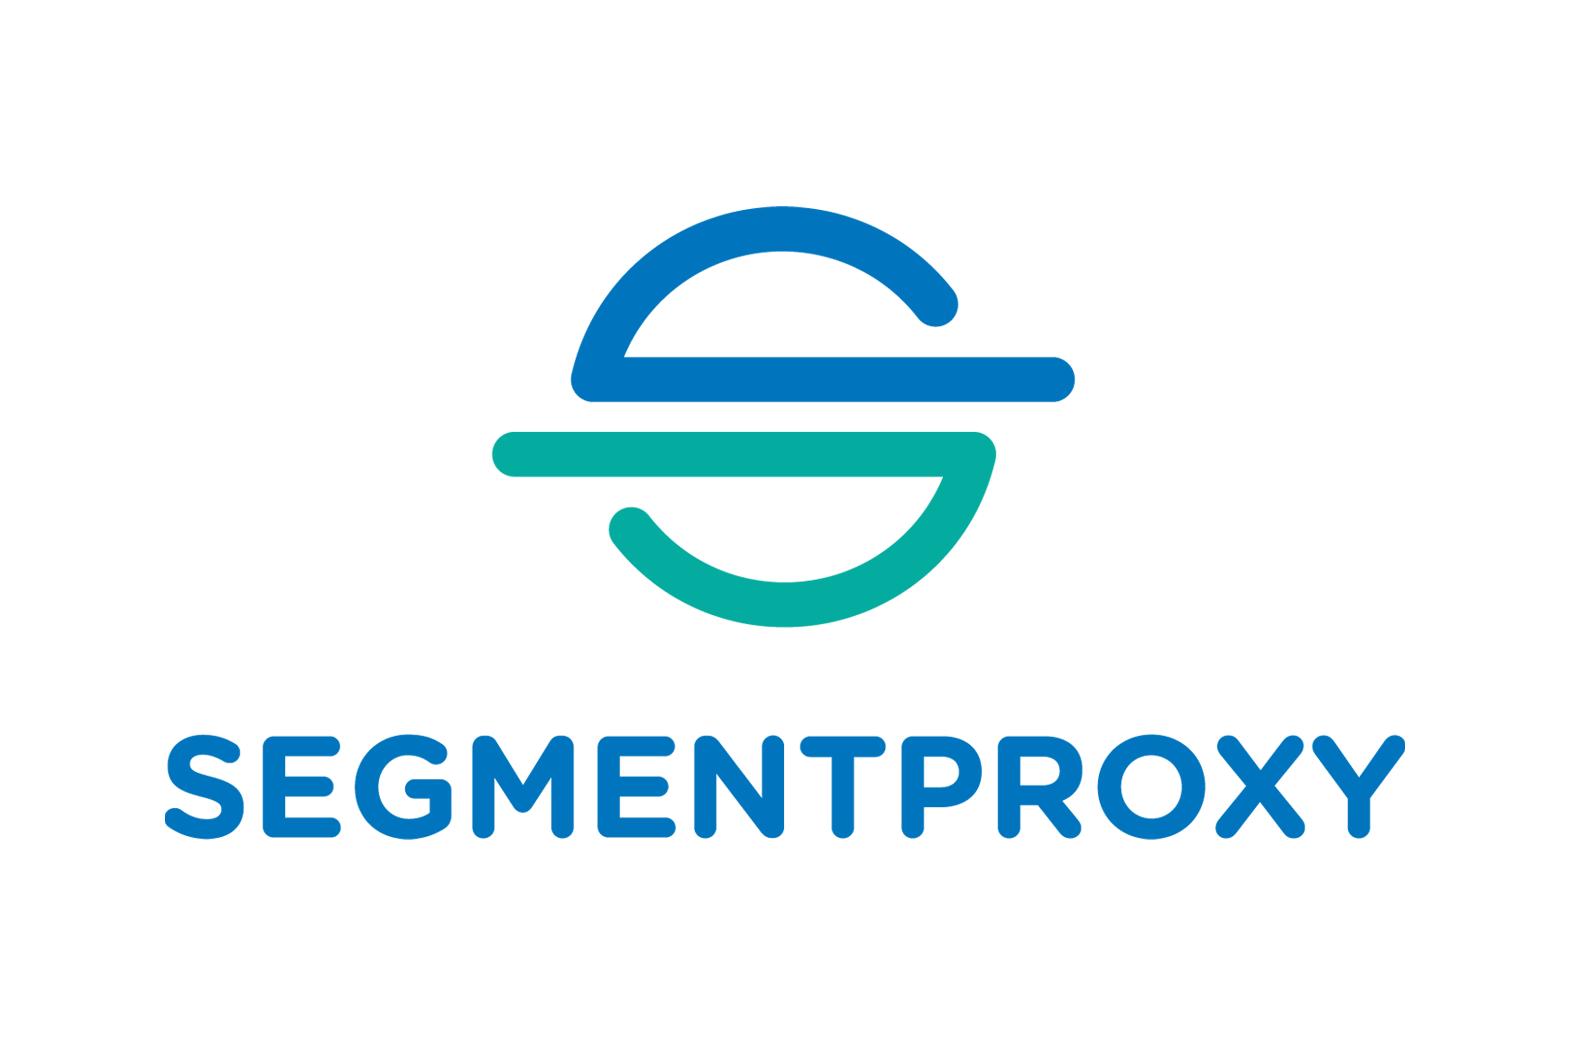 Segmentproxy